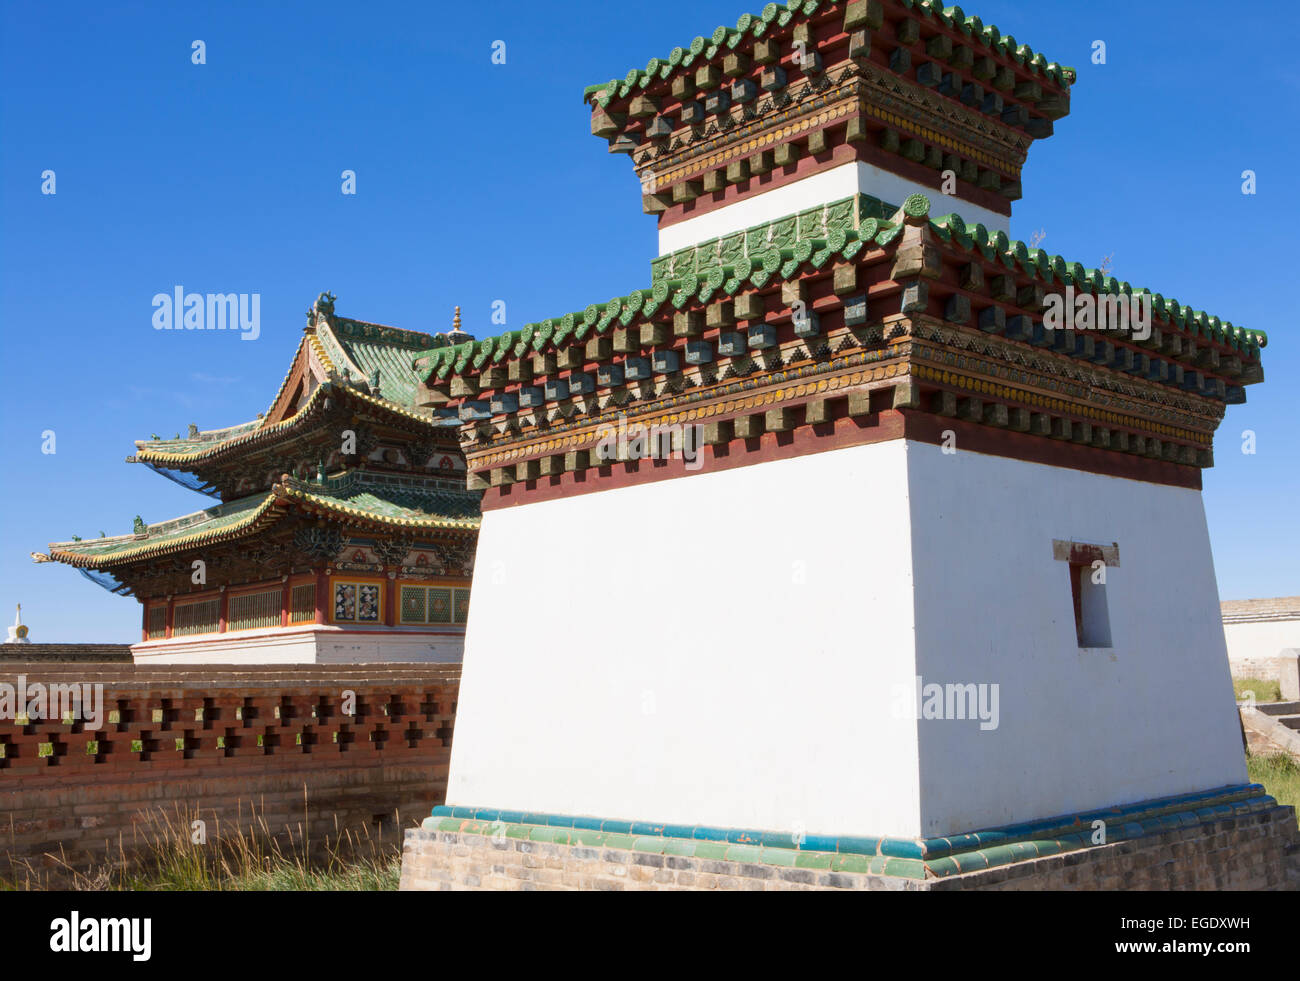 Temples at Erdene Zuu Khiid, Kharkhorin, Ovorkhangai, Mongolia - Stock Image